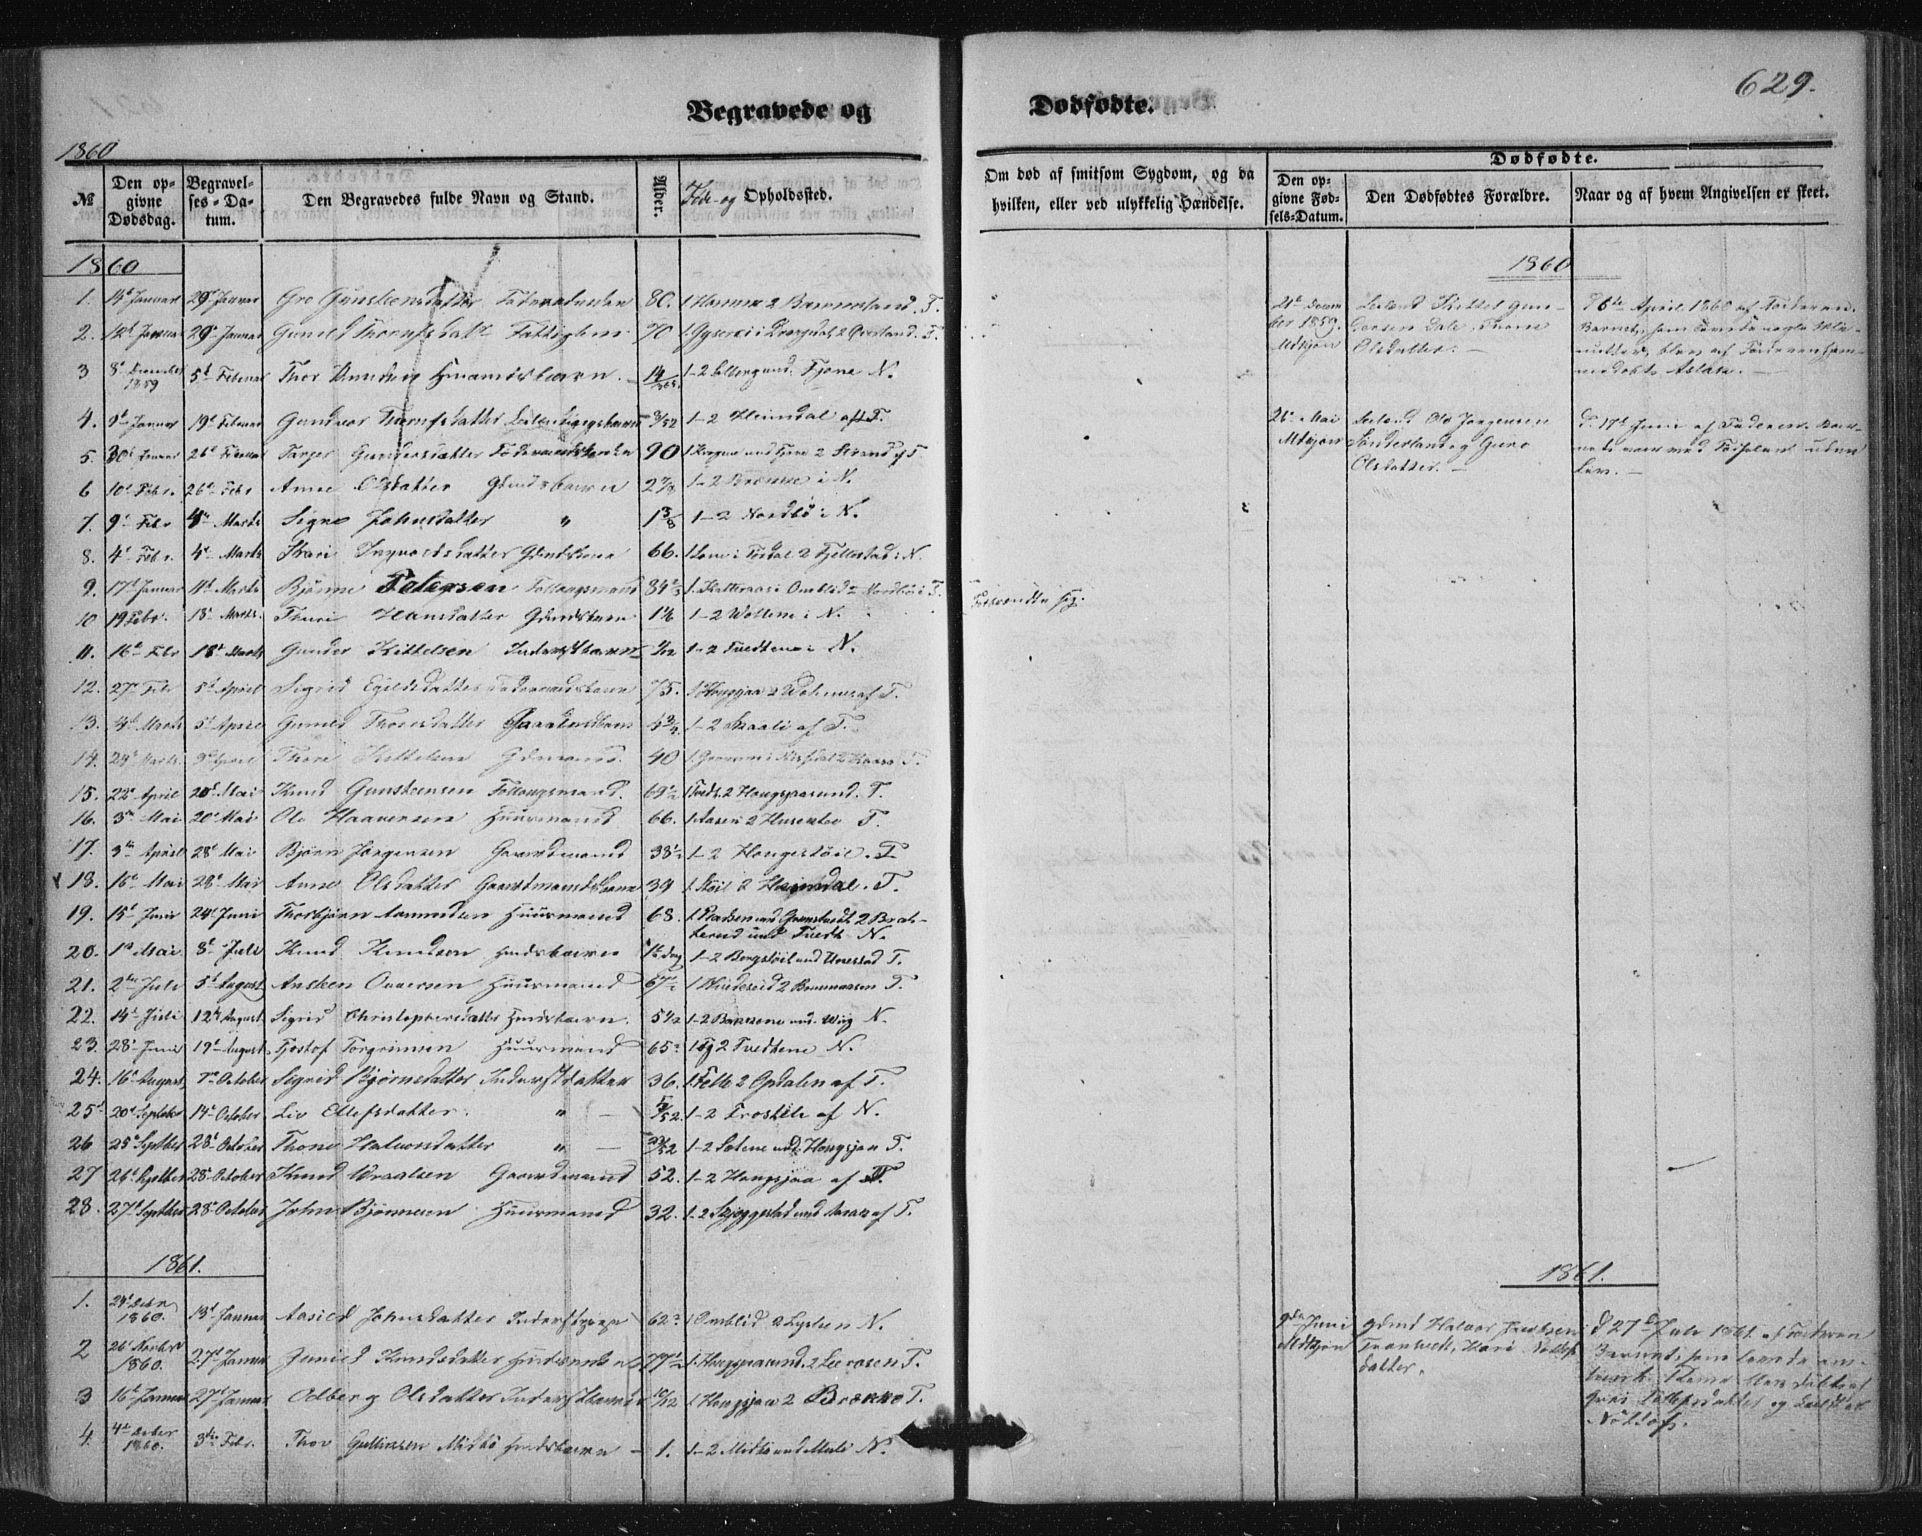 SAKO, Nissedal kirkebøker, F/Fa/L0003: Ministerialbok nr. I 3, 1846-1870, s. 628-629